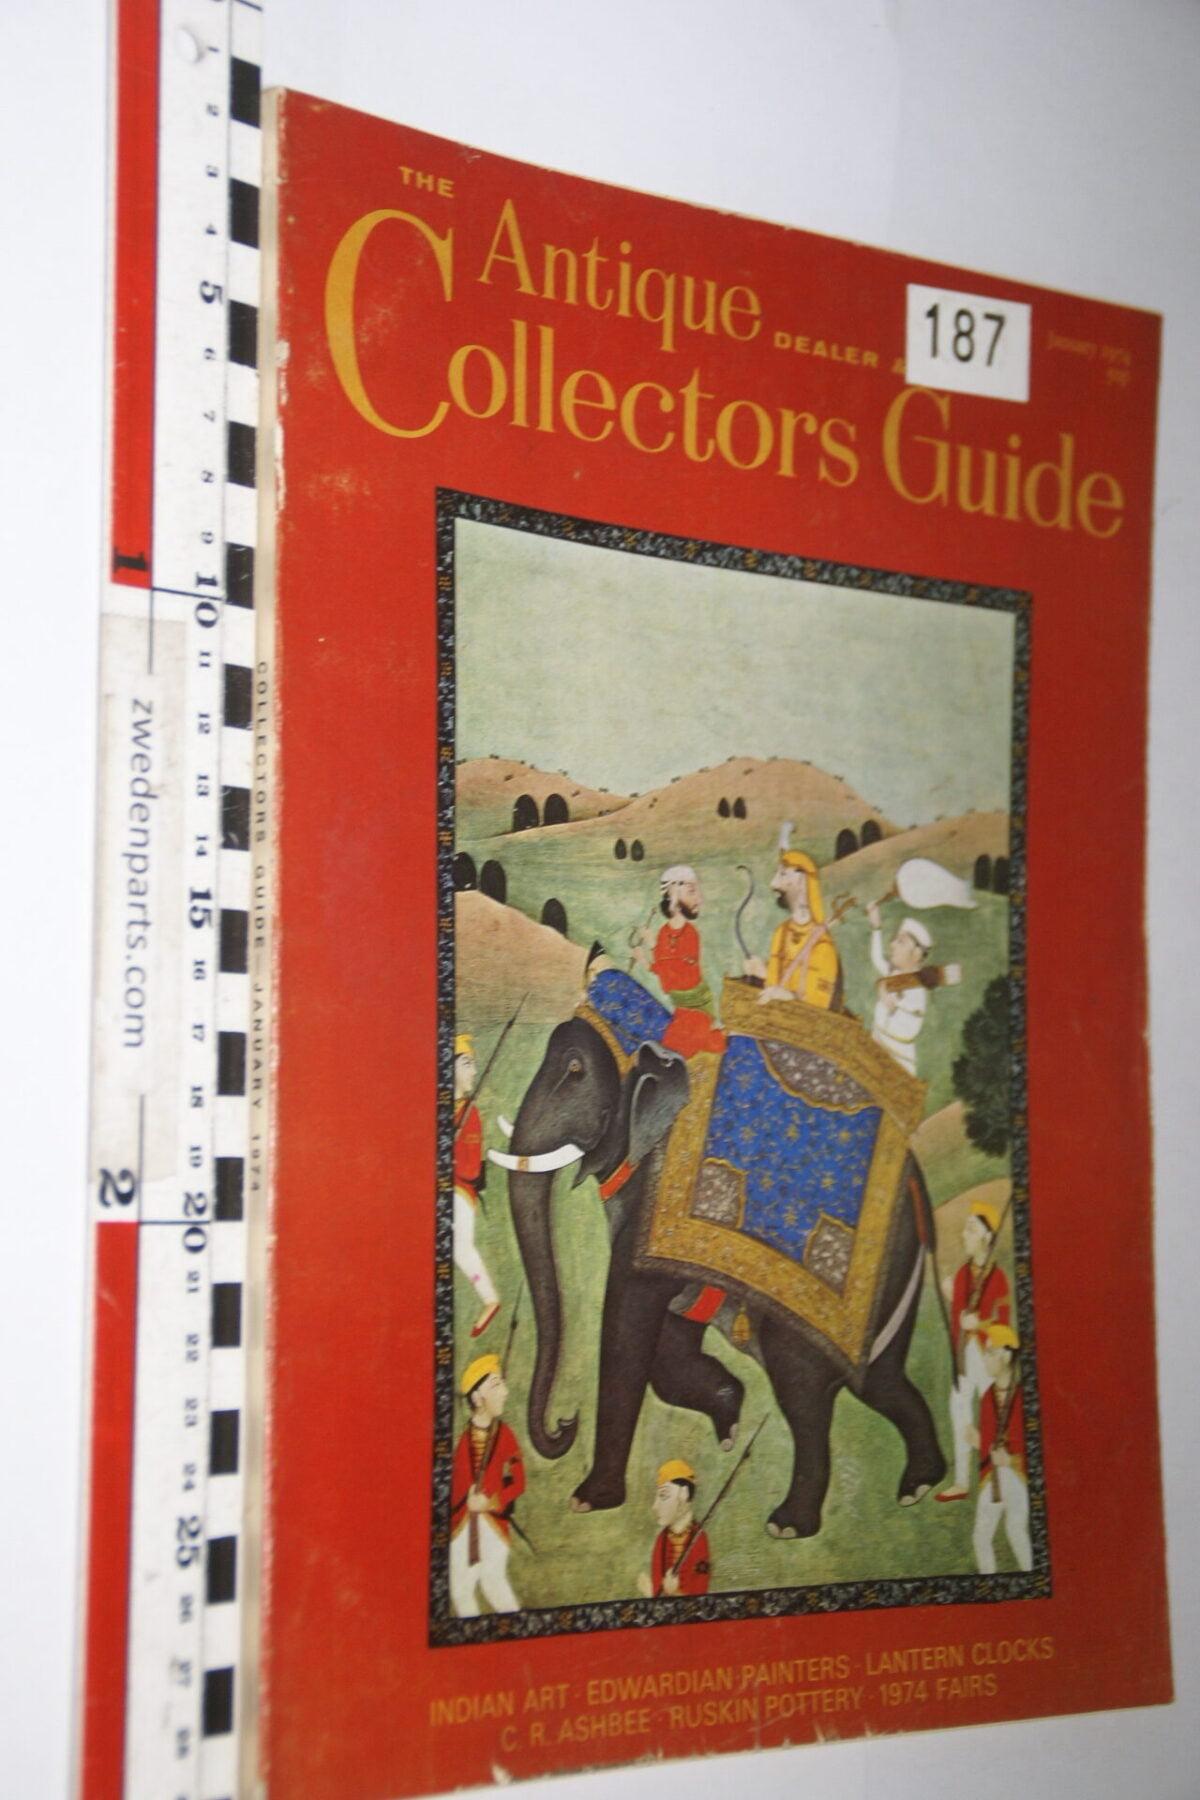 DSC06238 1974 januari tijdschrift Antique Collectors Guide, English-2fb57076